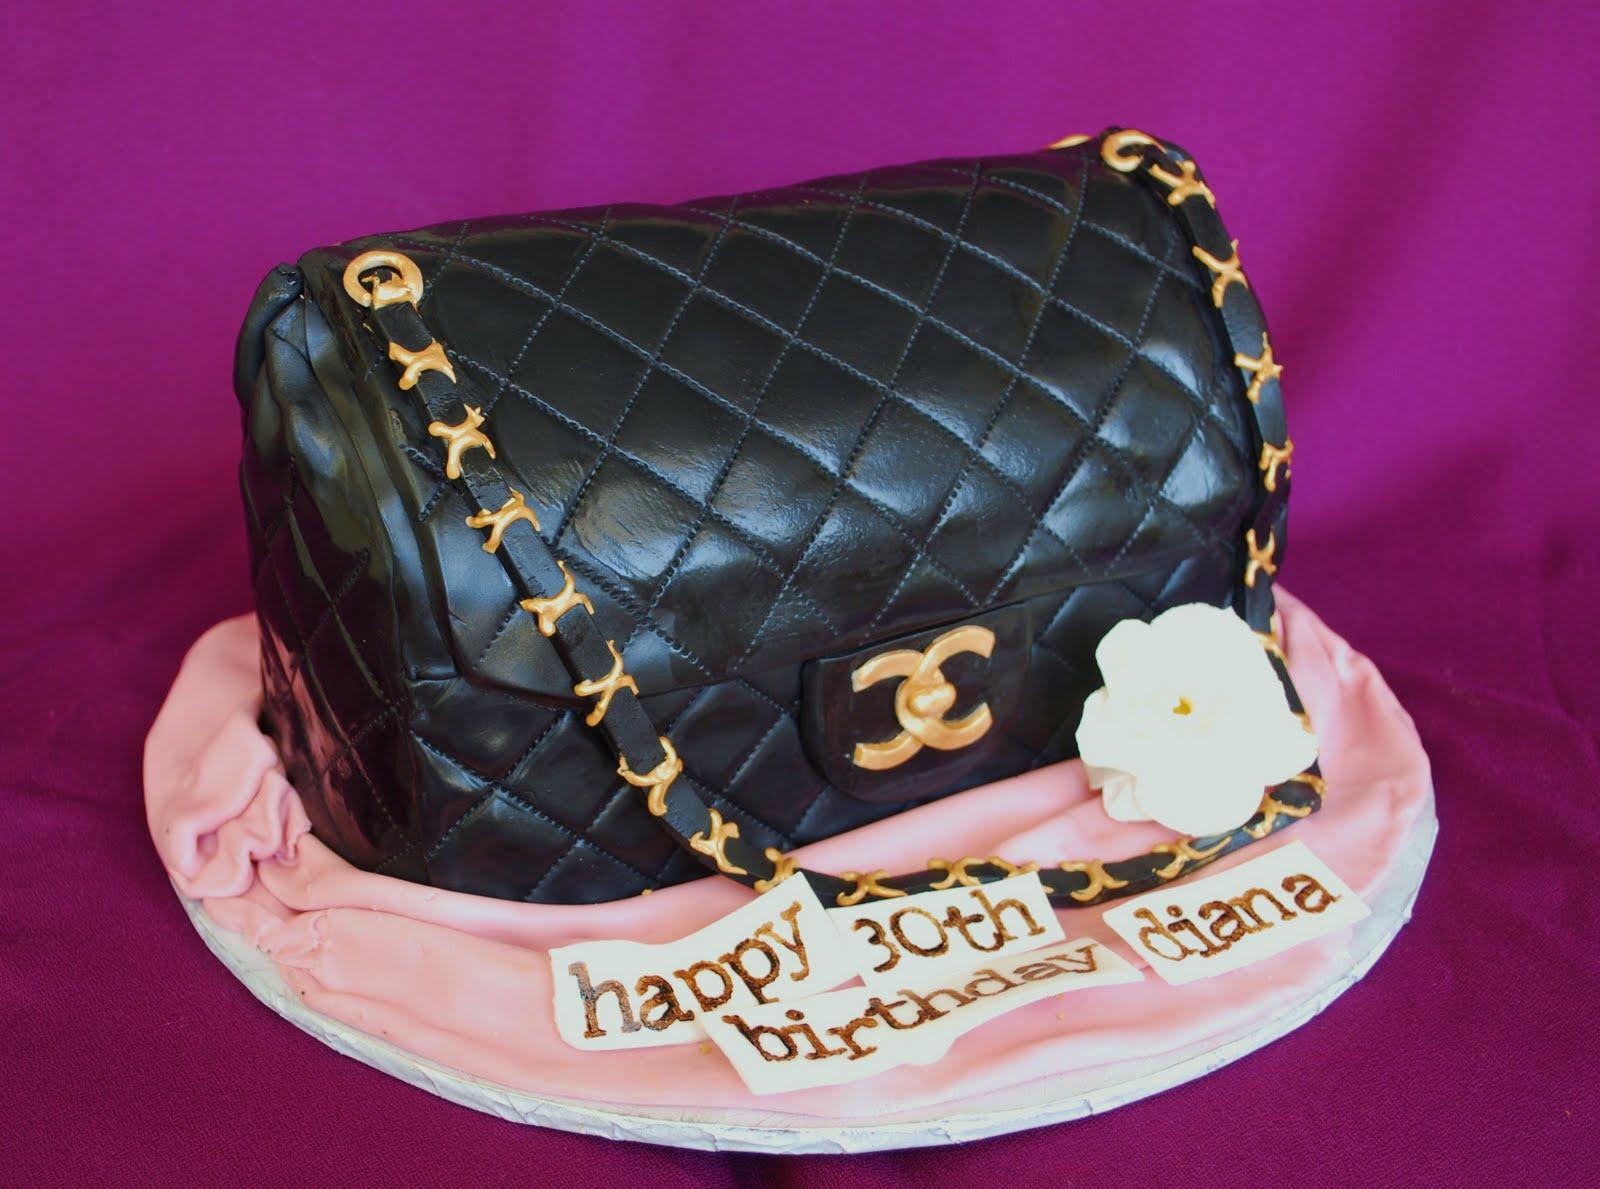 The Beehive: Designer Handbag Cake